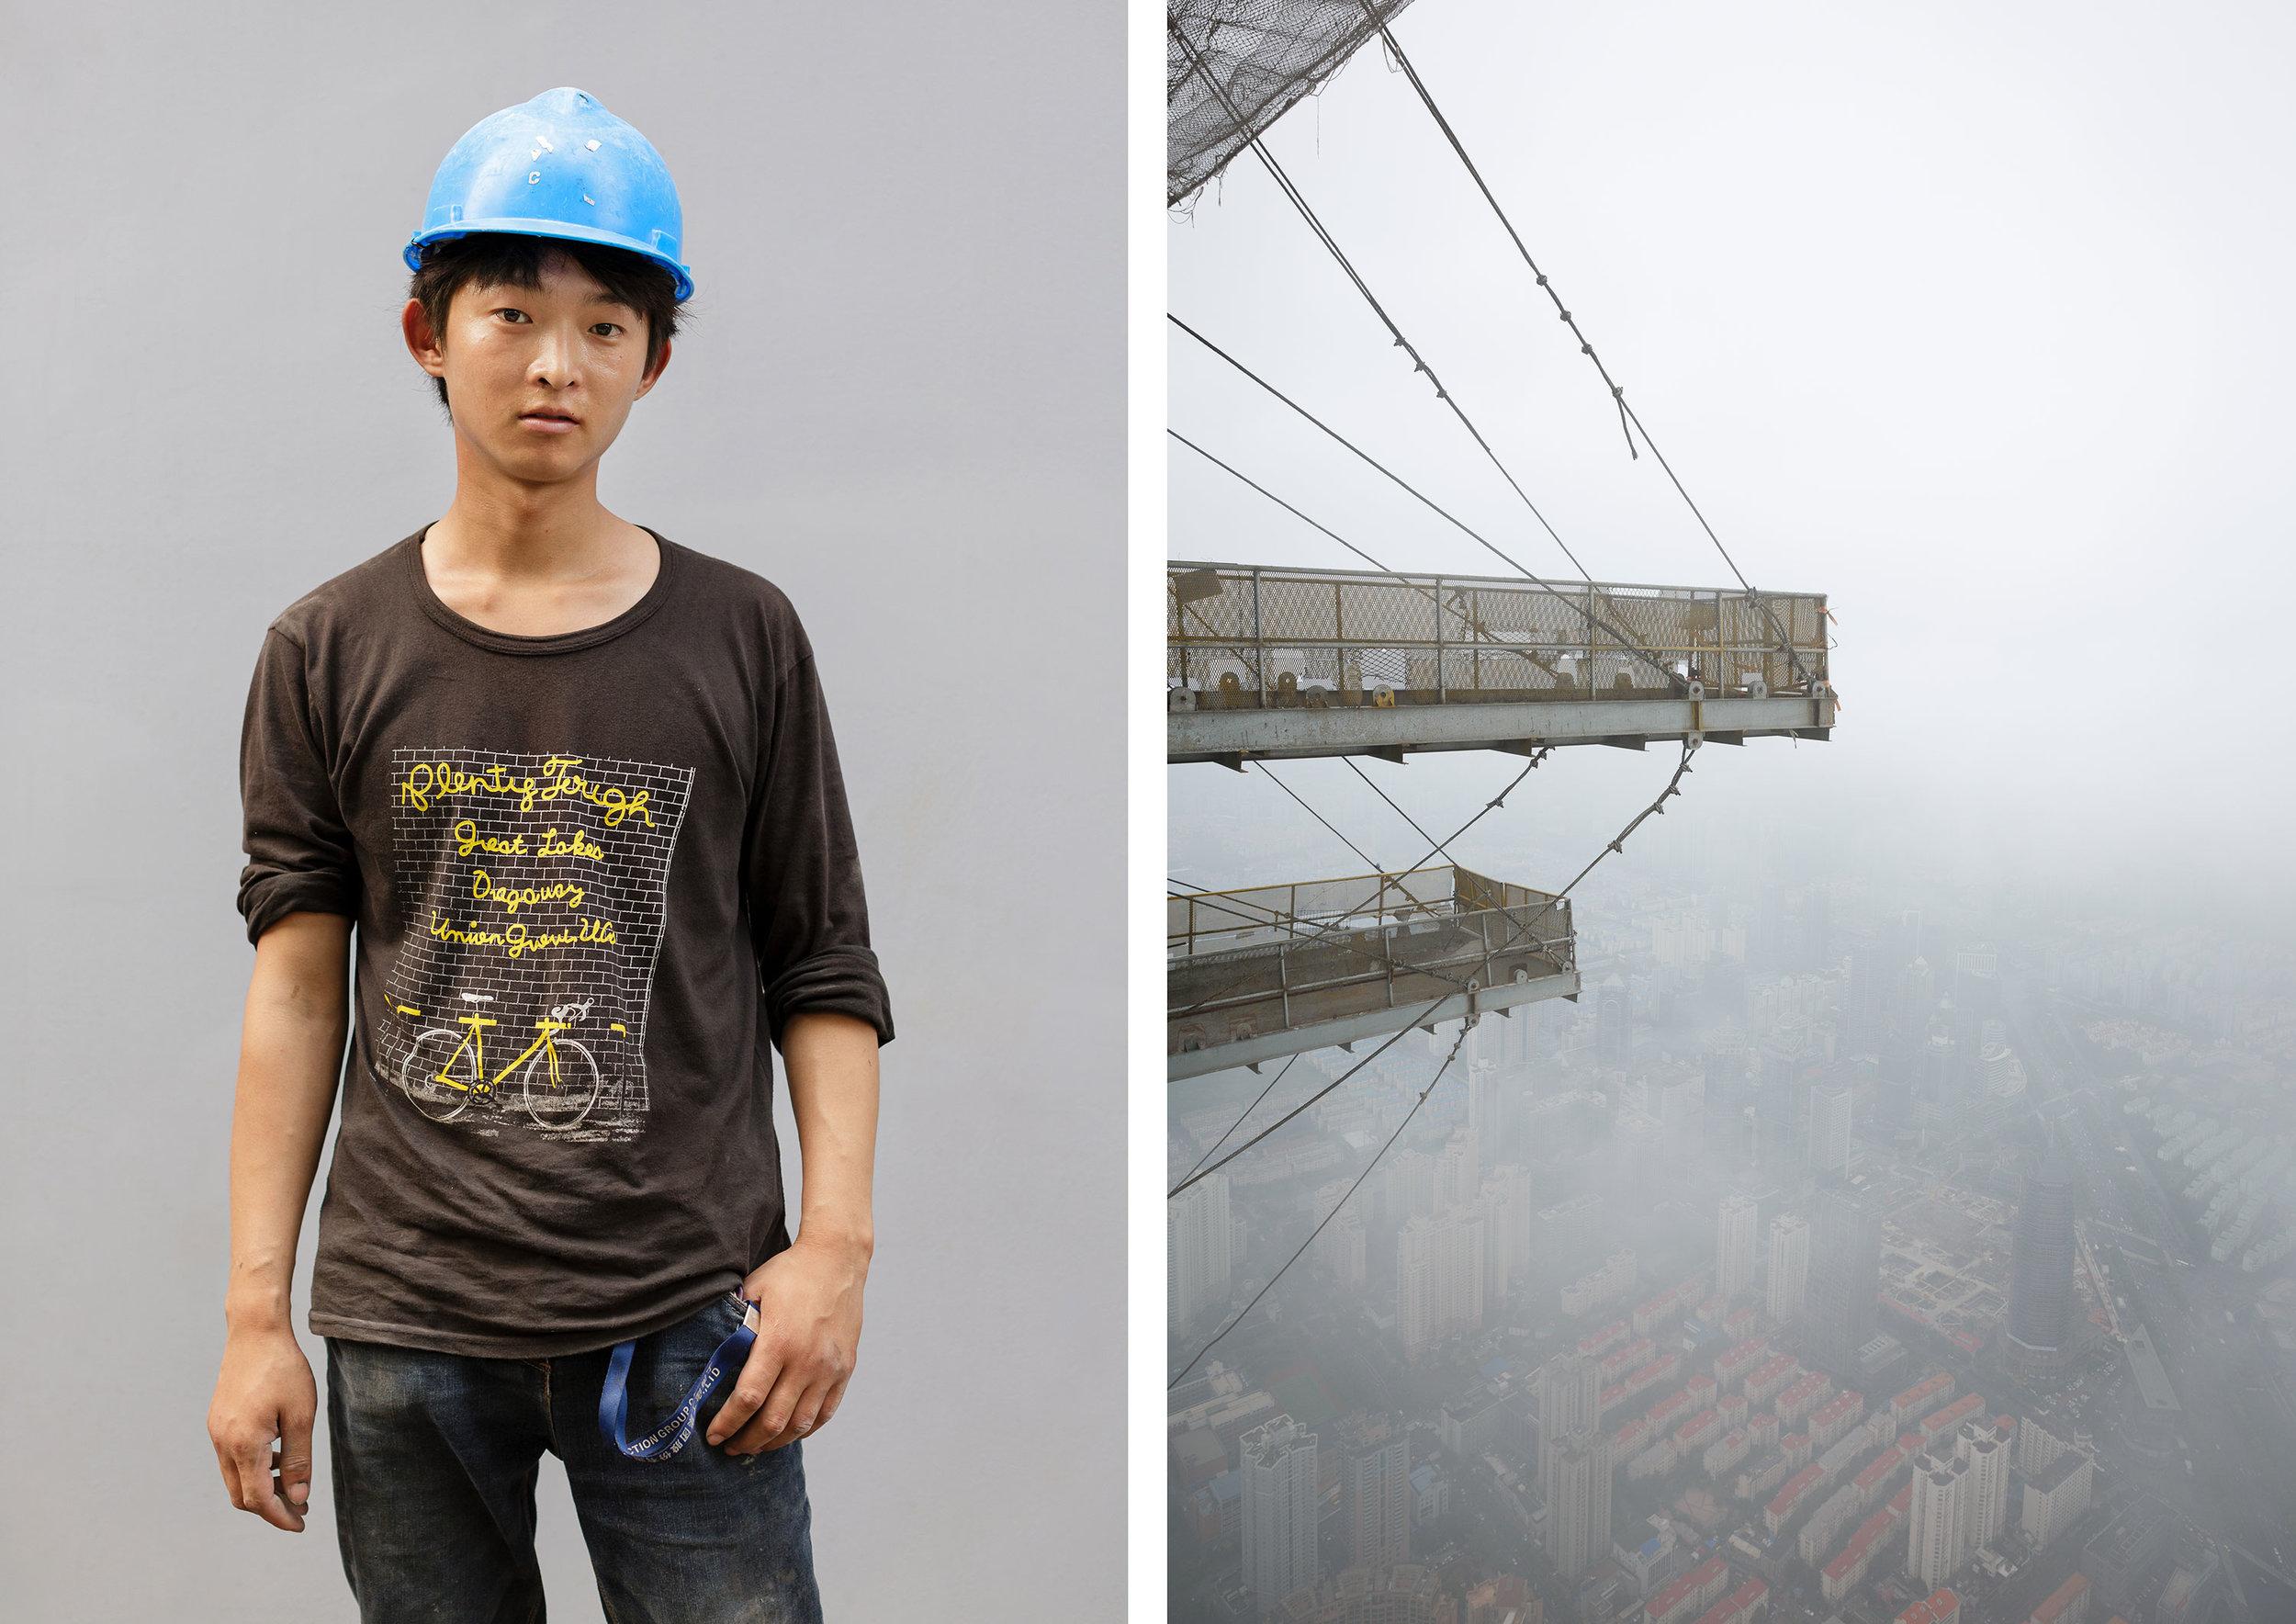 Shanghai_Tower-workers-and-building2.jpg